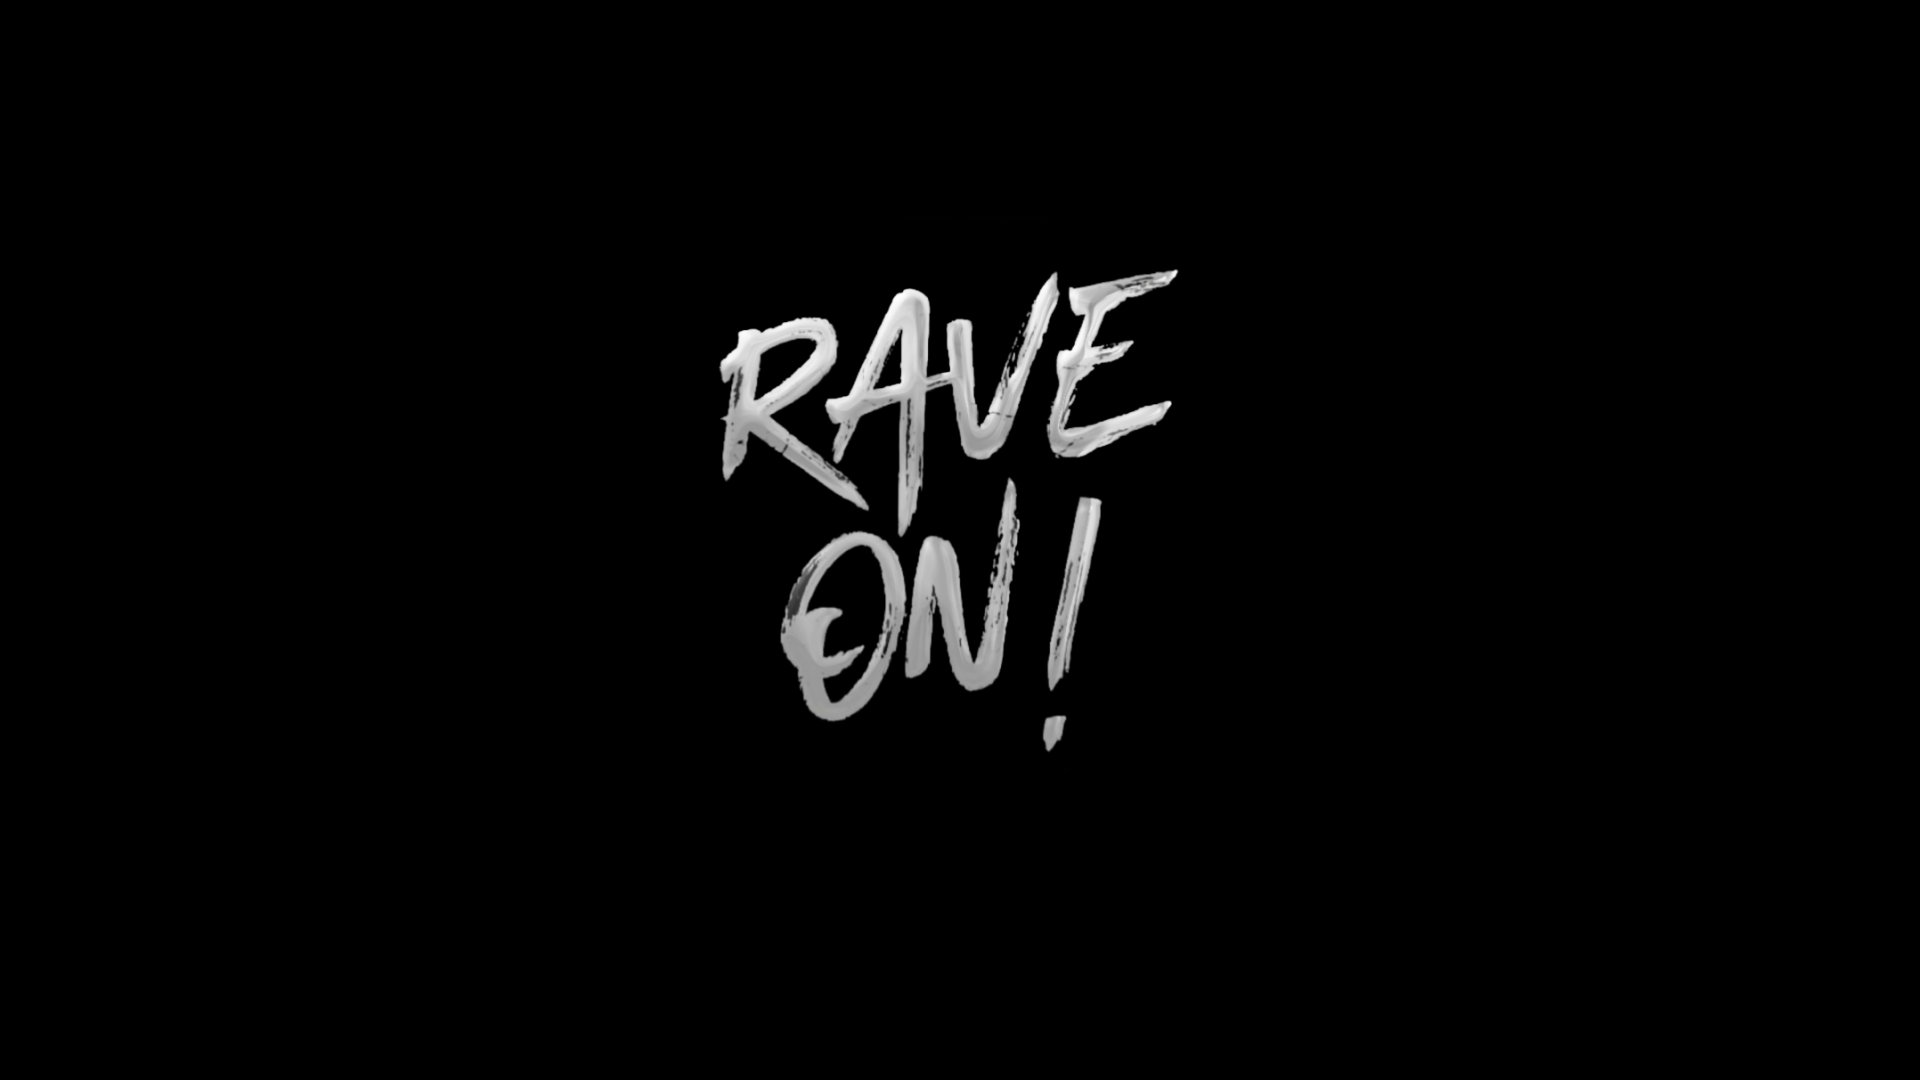 Rave On! Letz 🤘